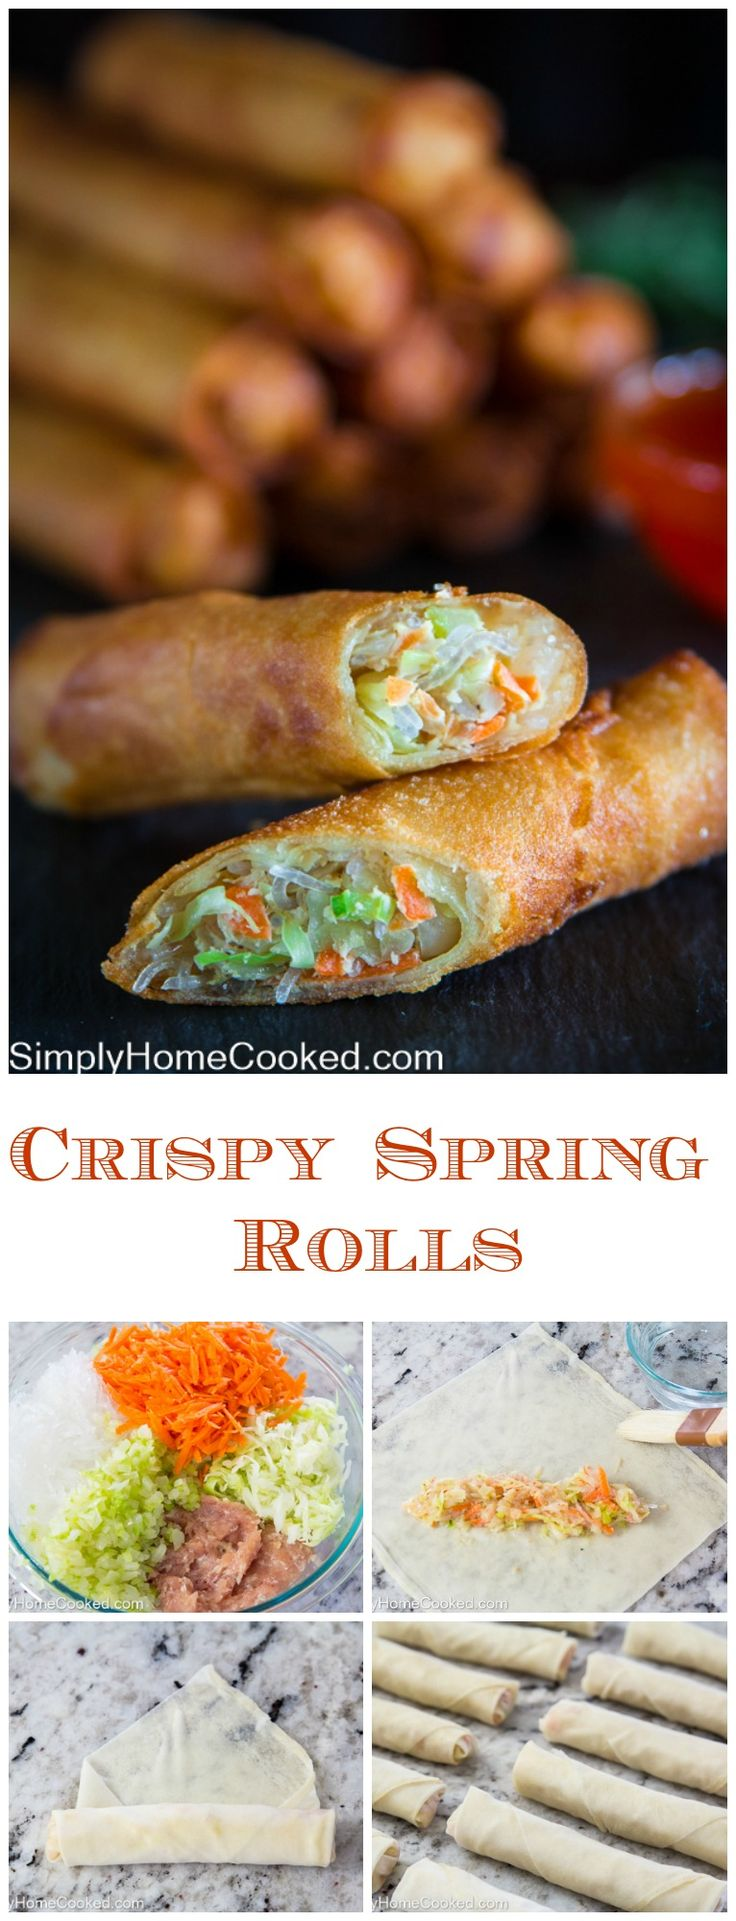 Easy fried spring rolls. I feel like this may need more seasonings.